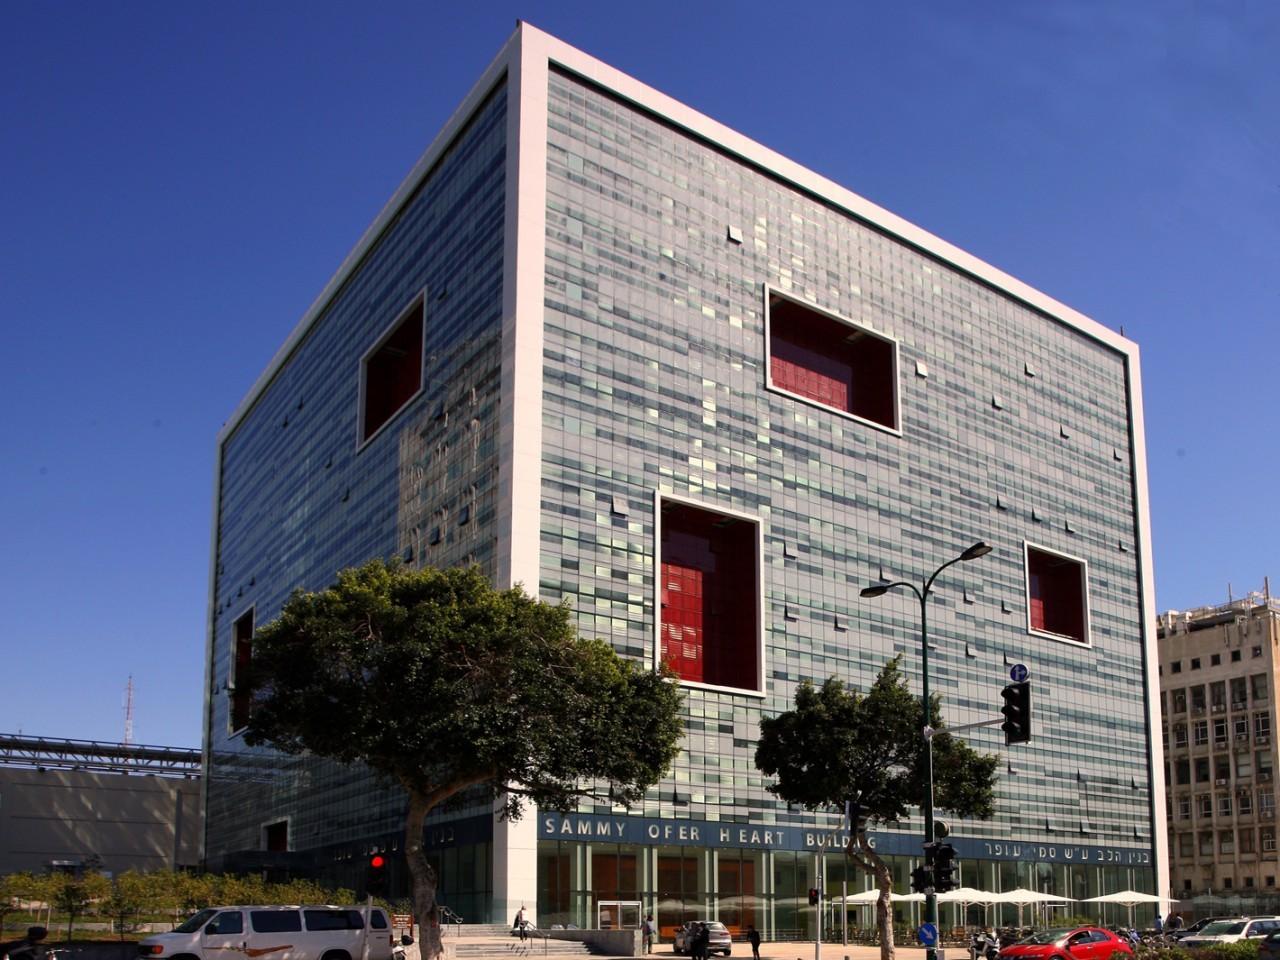 Sammy Ofer Heart Building / Sharon Architects & Ranni Ziss Architects, © Rona Vatash